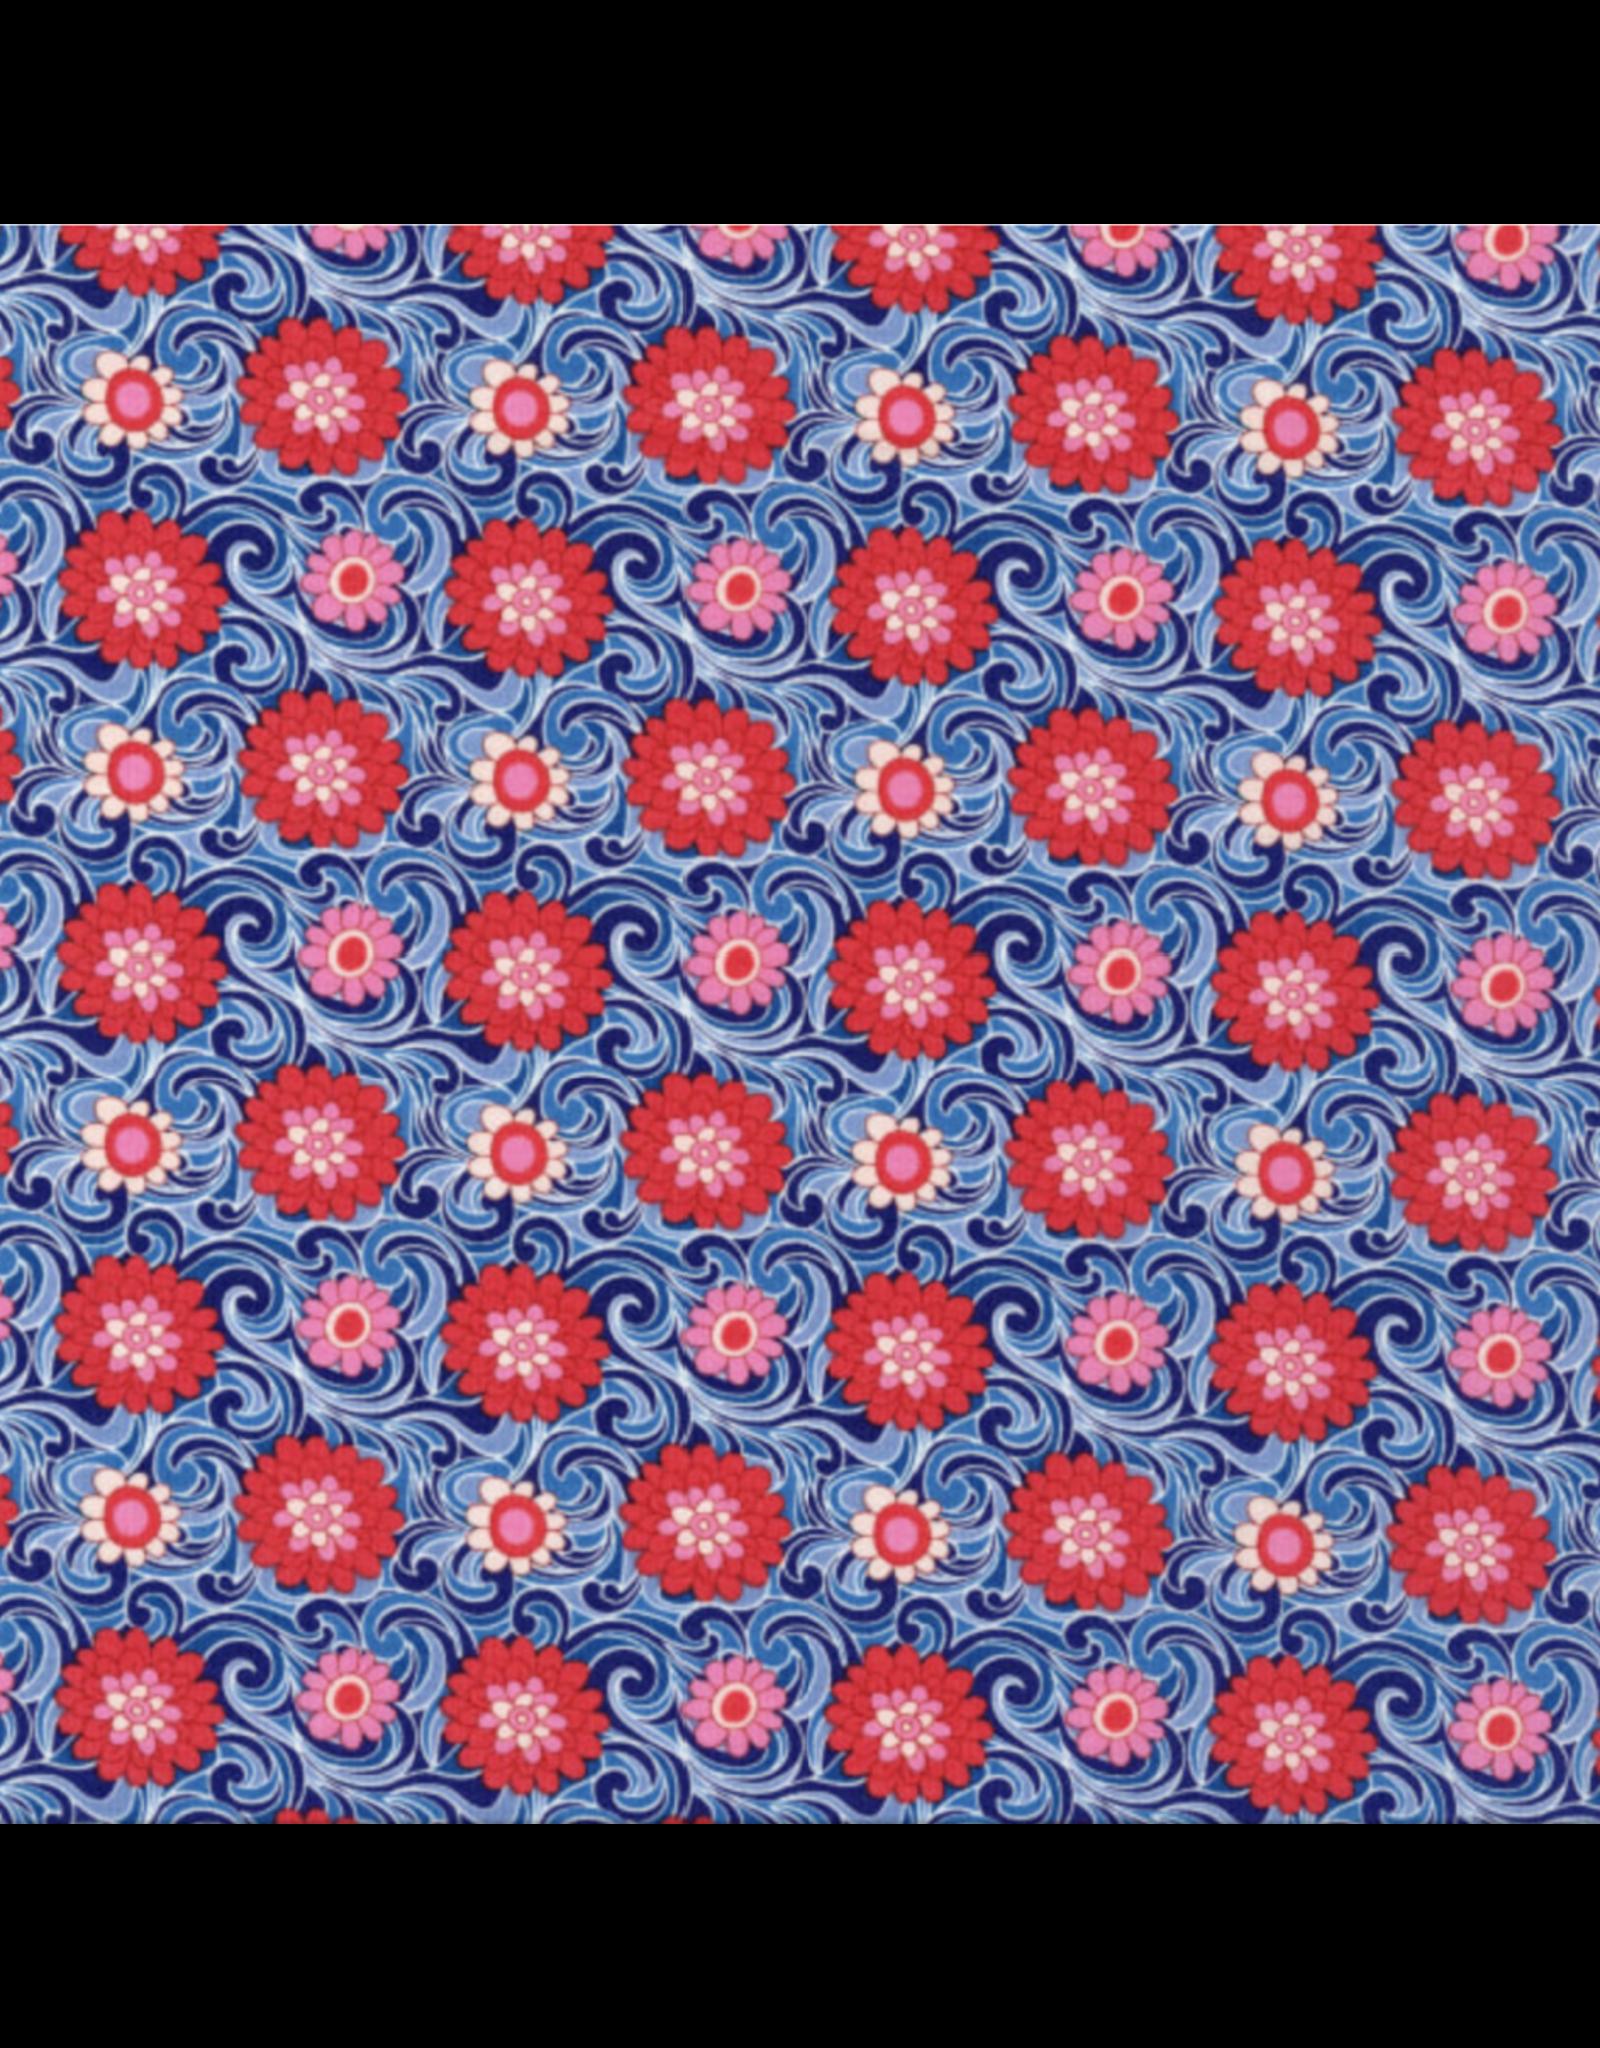 Liberty Fabrics Liberty The Carnaby Collection, Carnation in Retro Indigo, Fabric Half-Yards